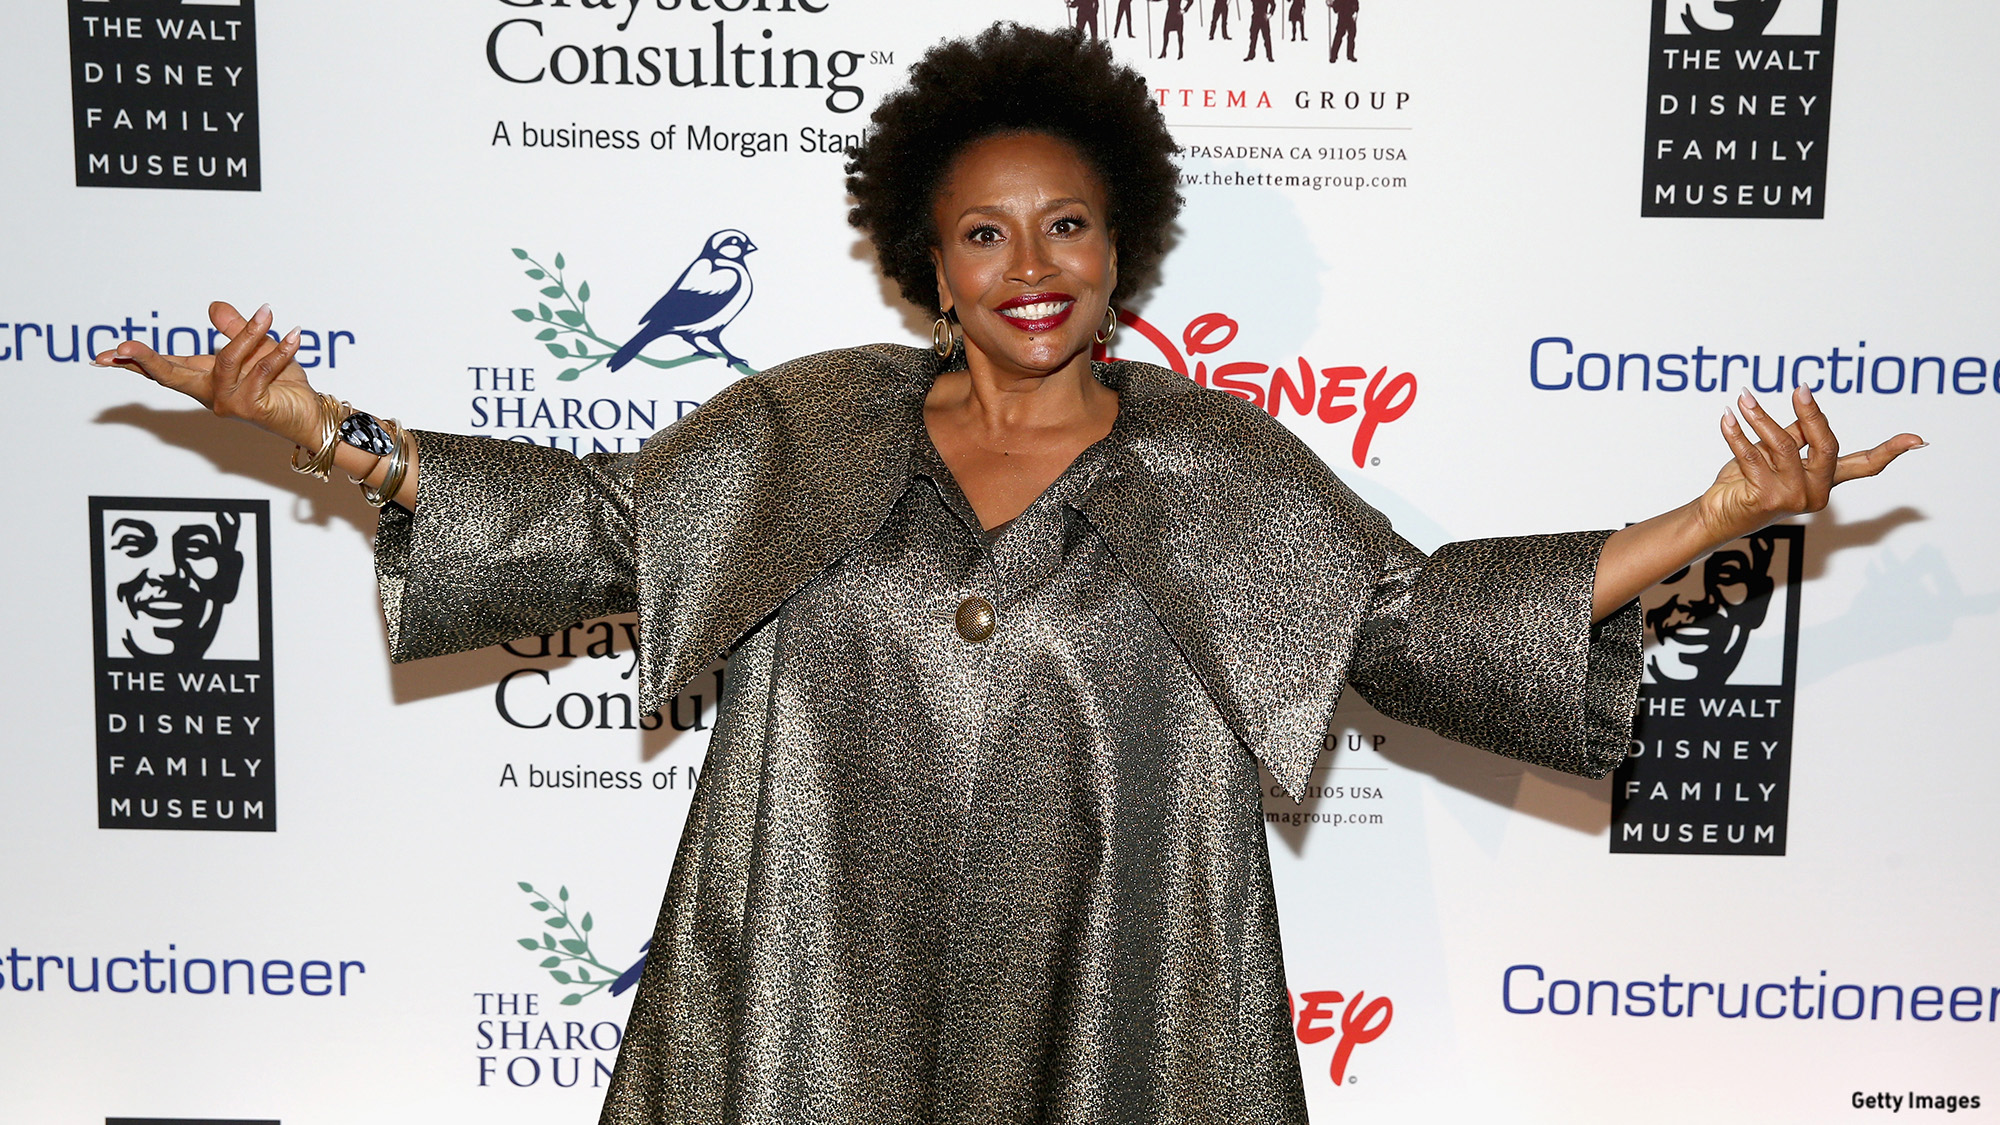 Jenifer Lewis: The Mother of Black Hollywood: A Memoir